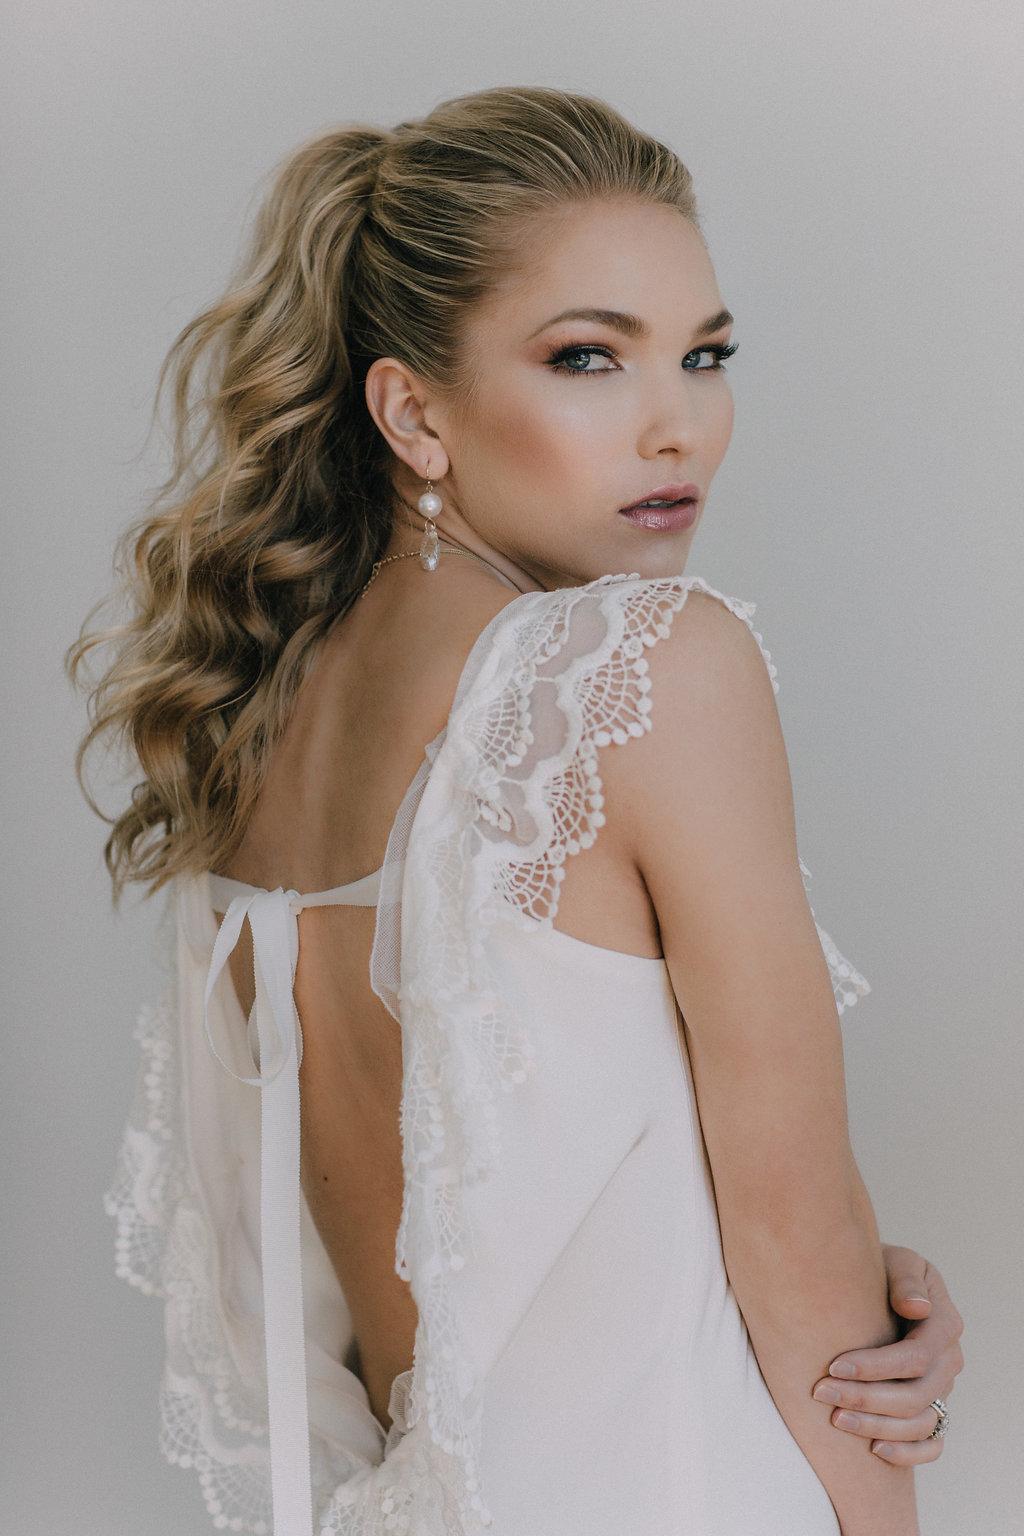 engle-olson-lady-vamp-look-book-jenna-mahr-photography-12.jpg